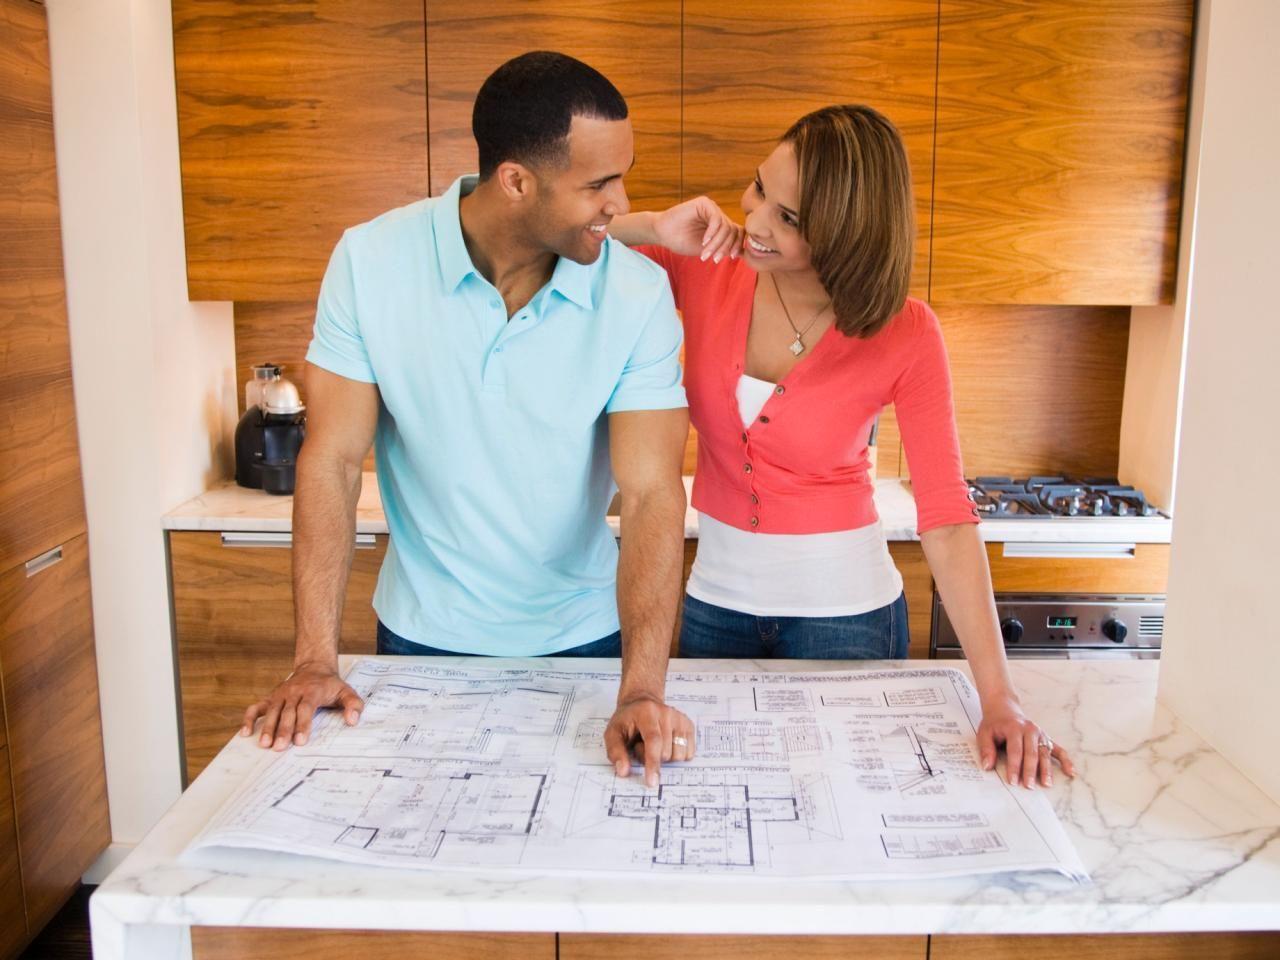 Planning Your Kitchen Remodel Hgtv Kitchens And Kitchen Design - Kitchen remodel planning guide